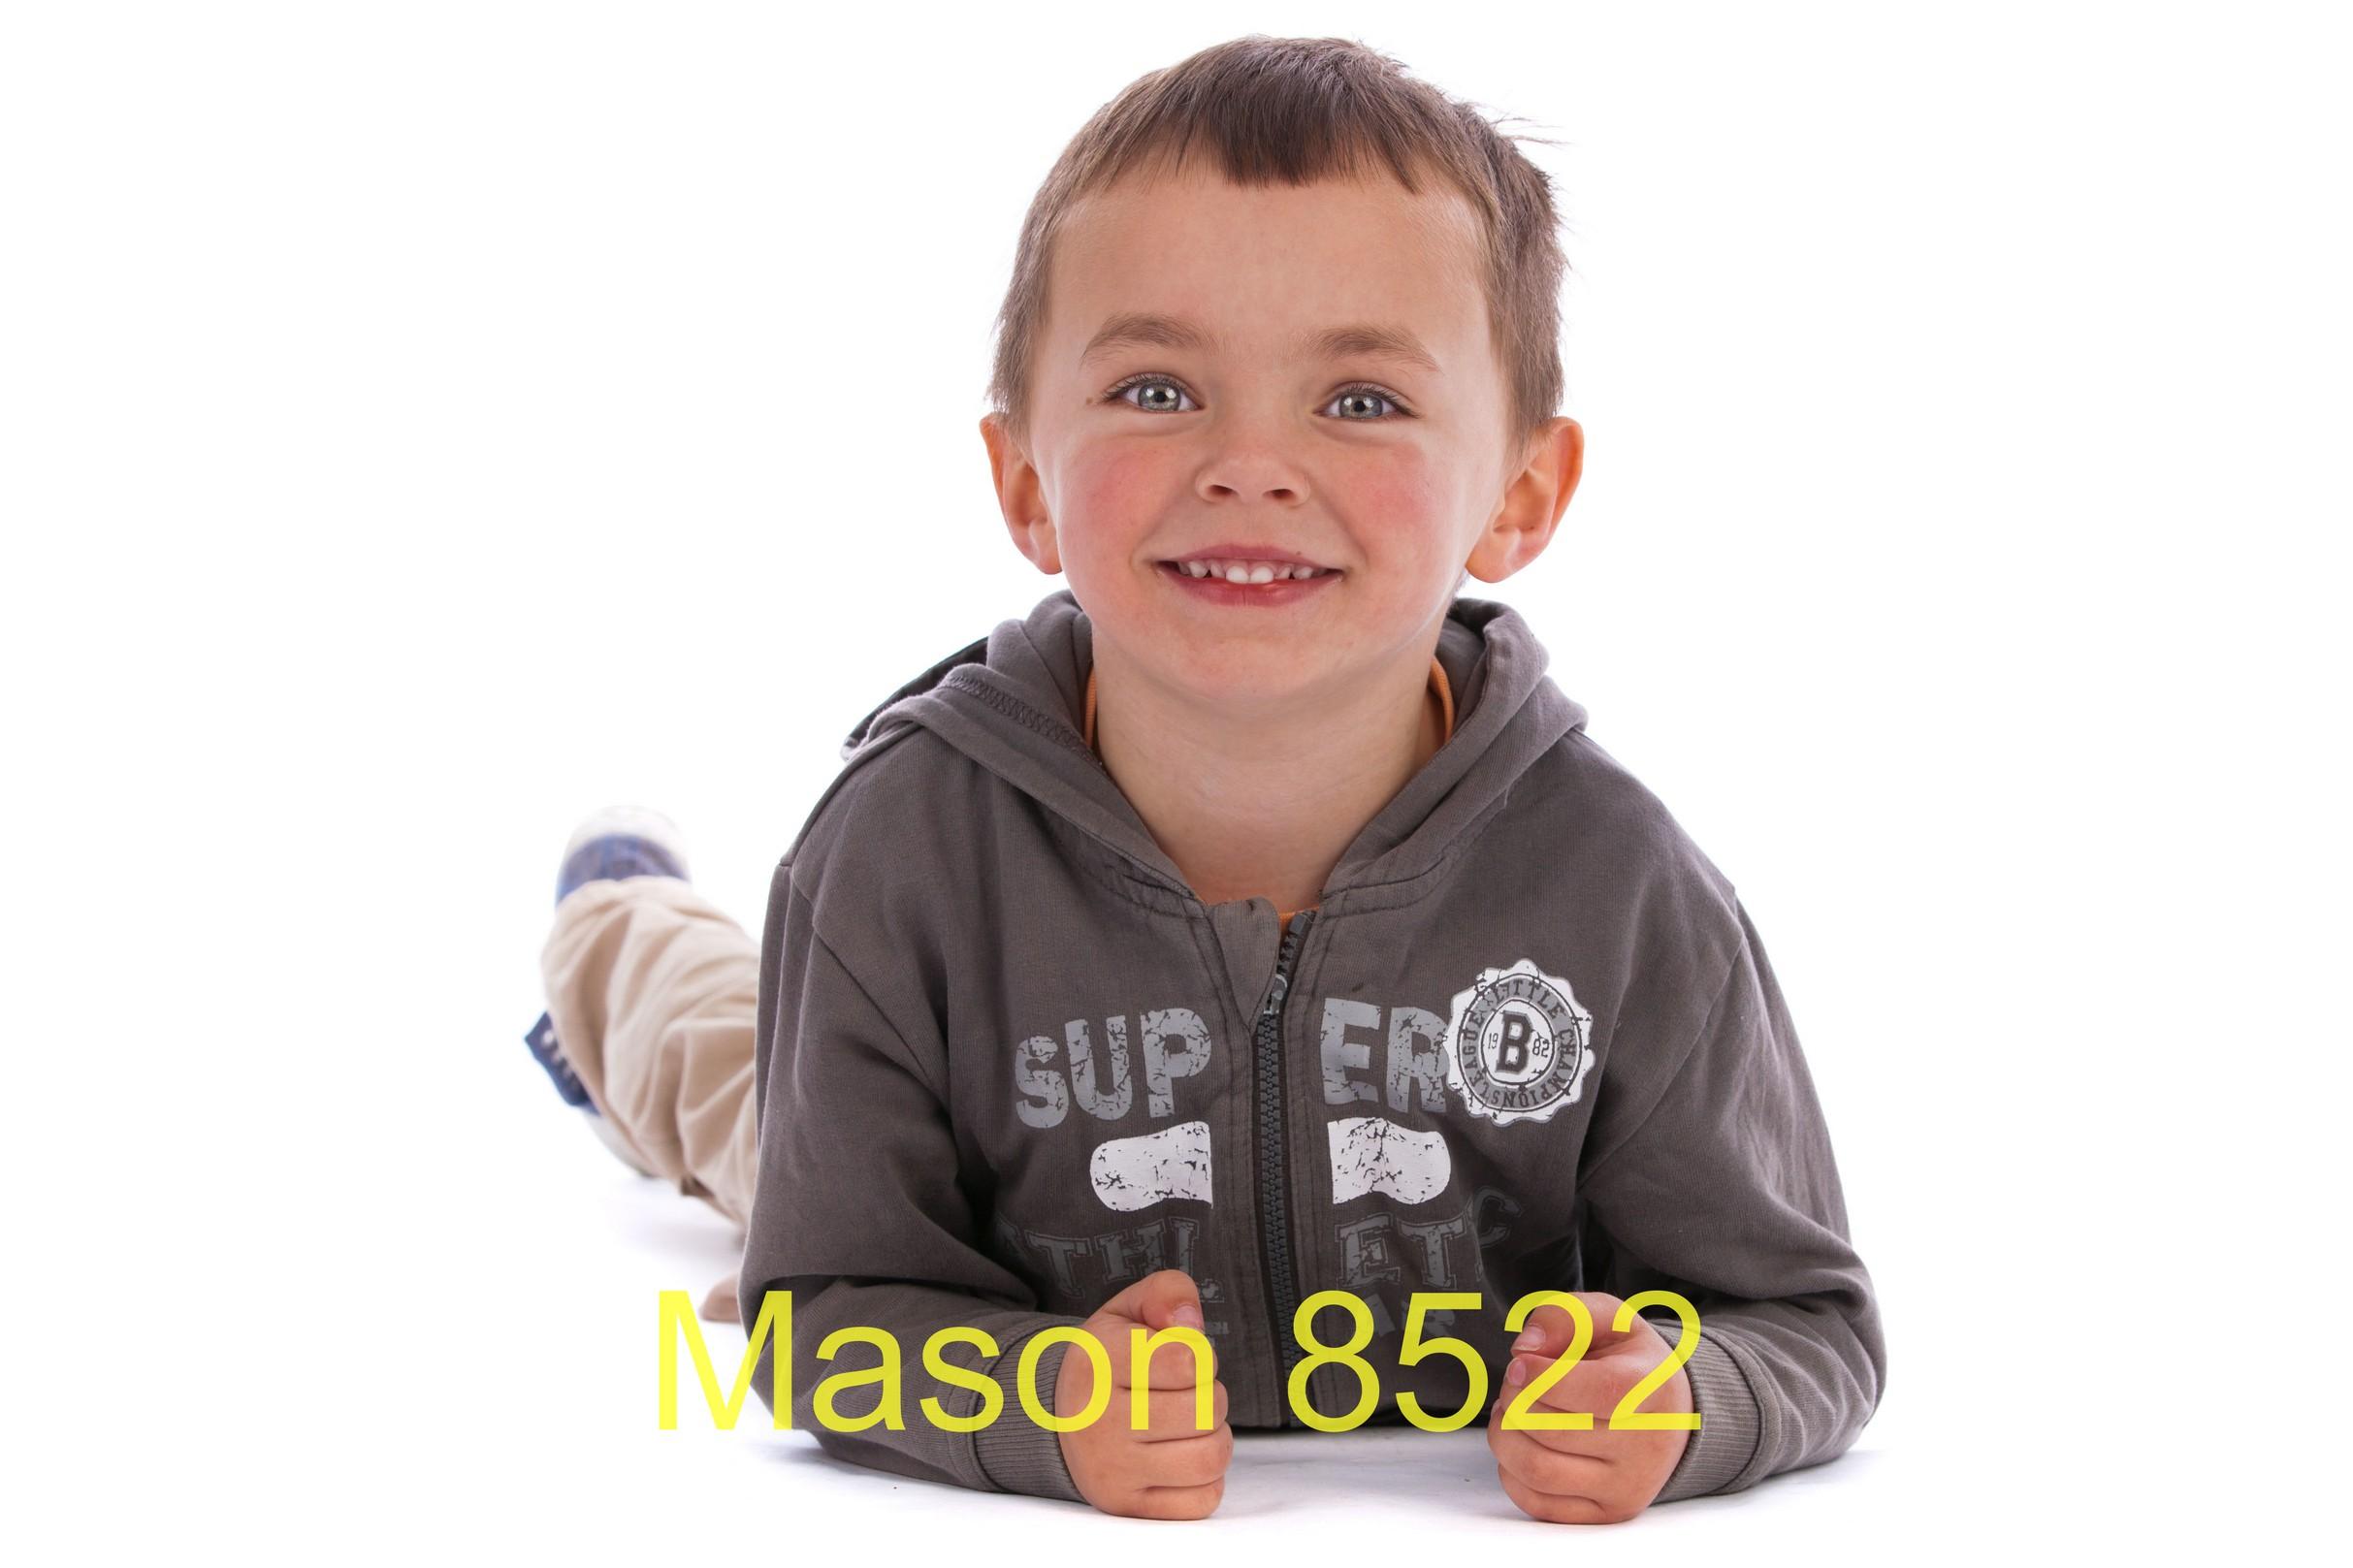 Mason 8522